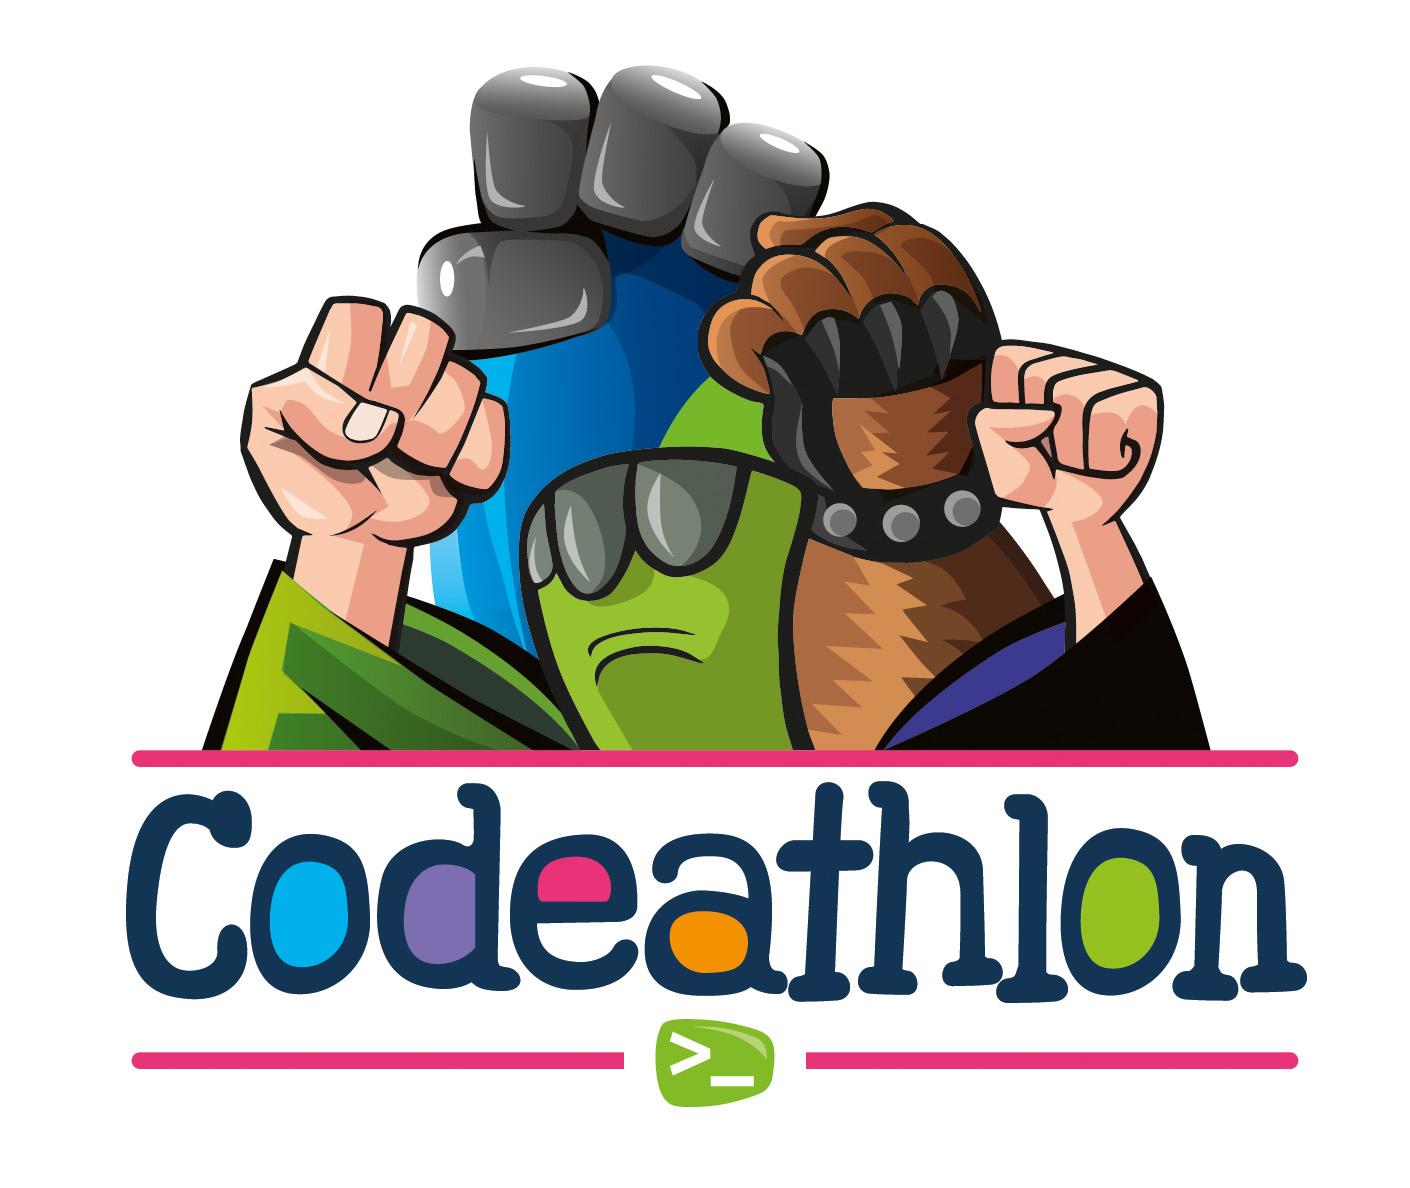 En marxa la segona Codeathlon!